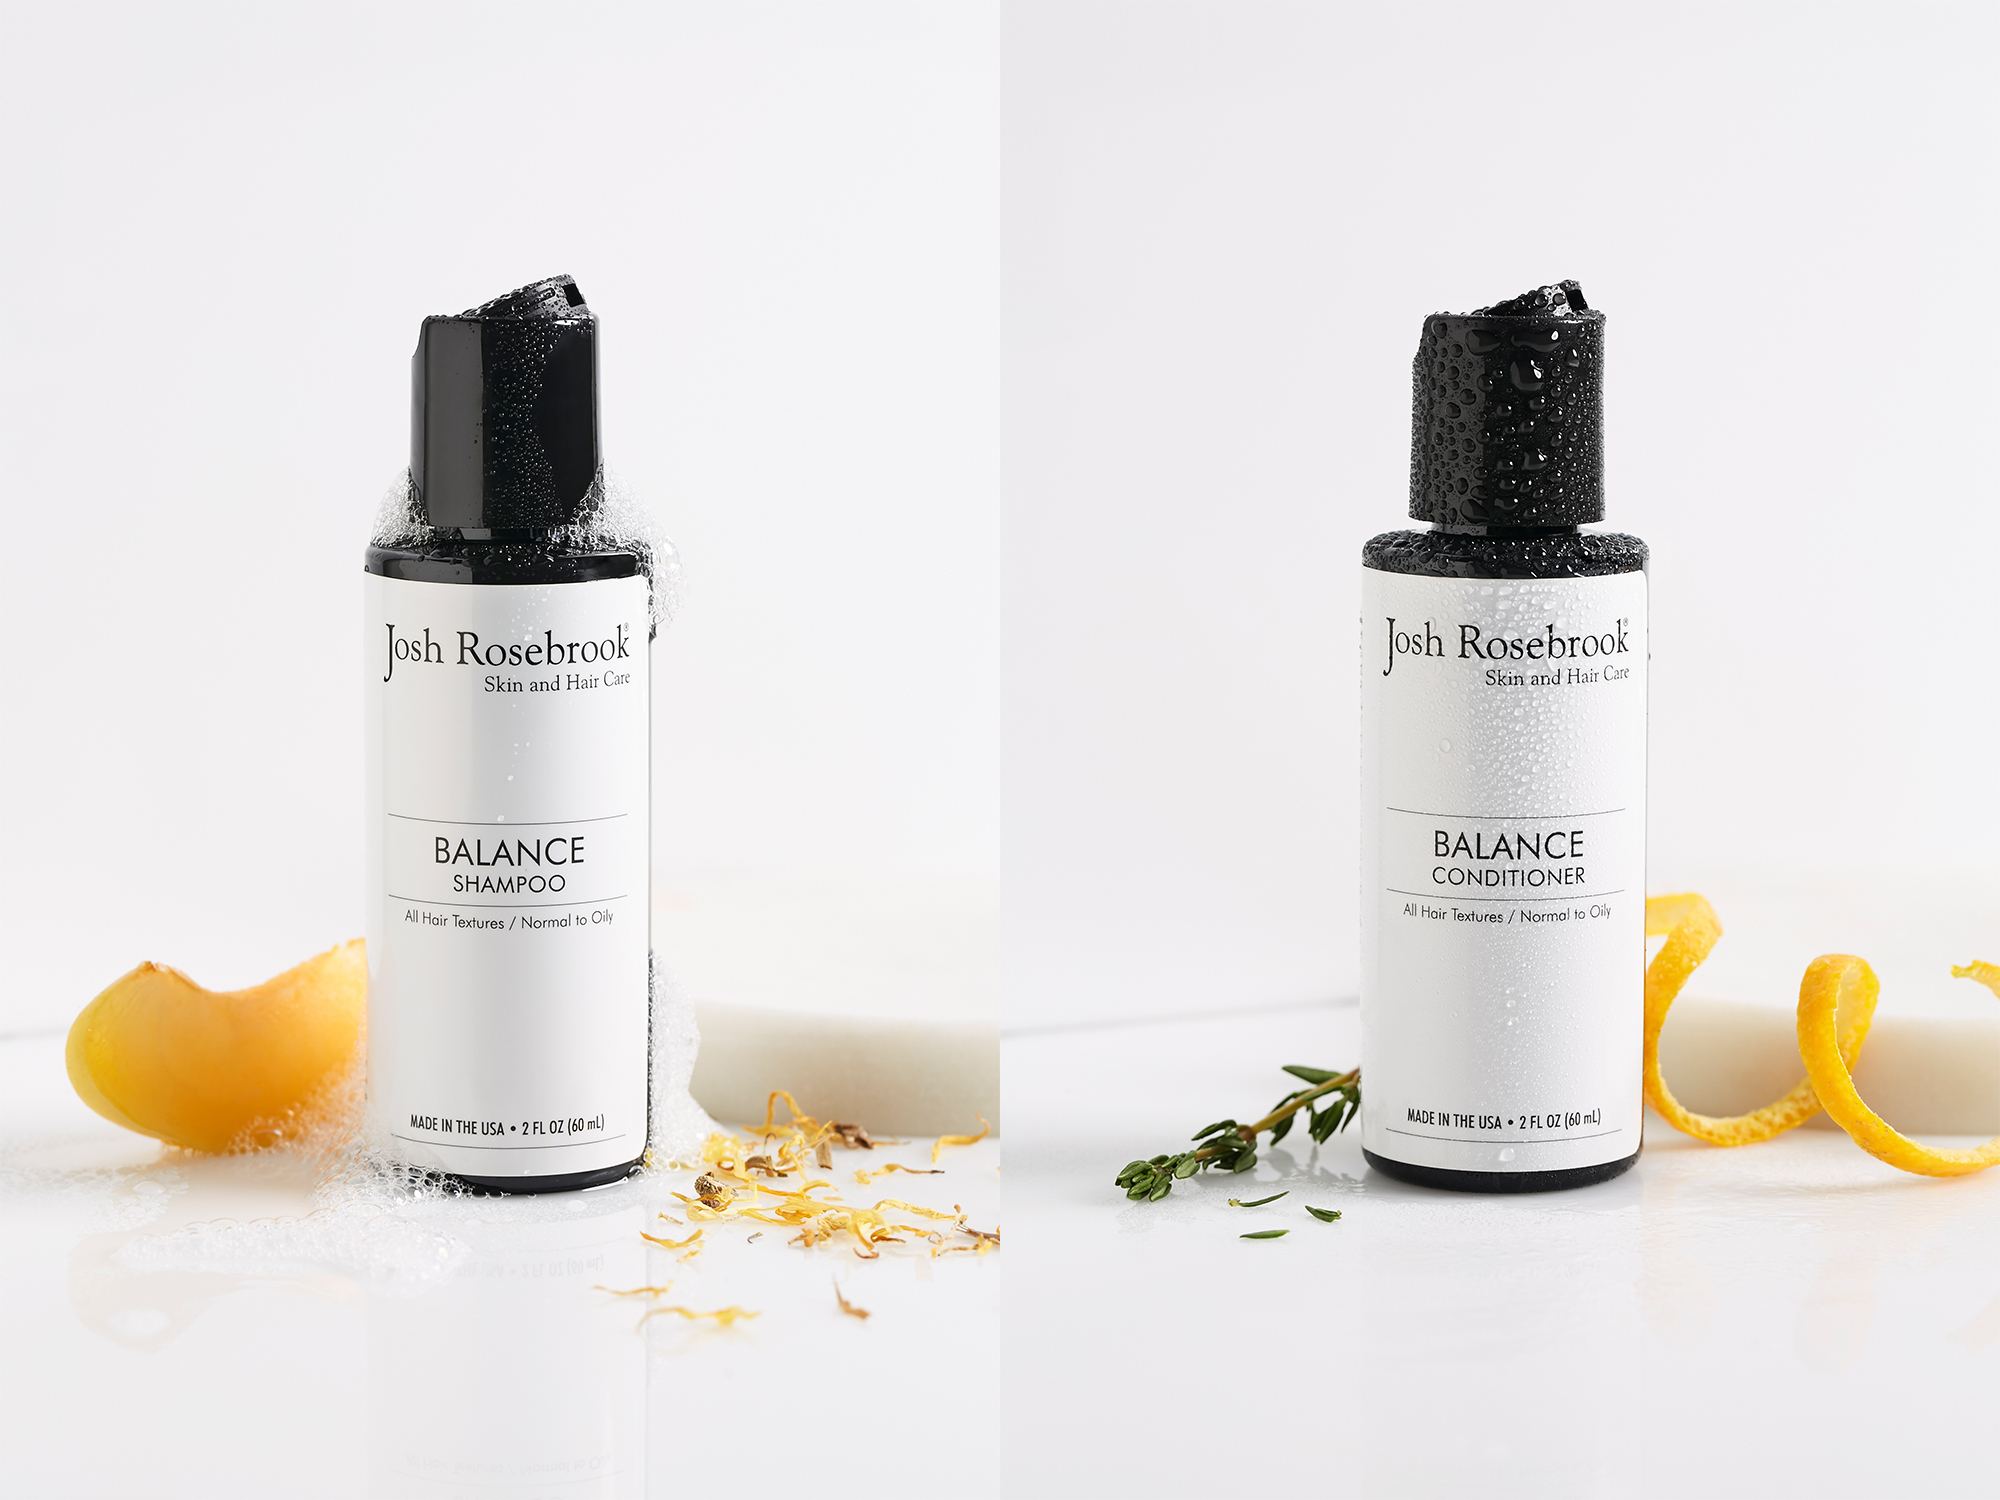 shampoo-and-condition-rosebrook